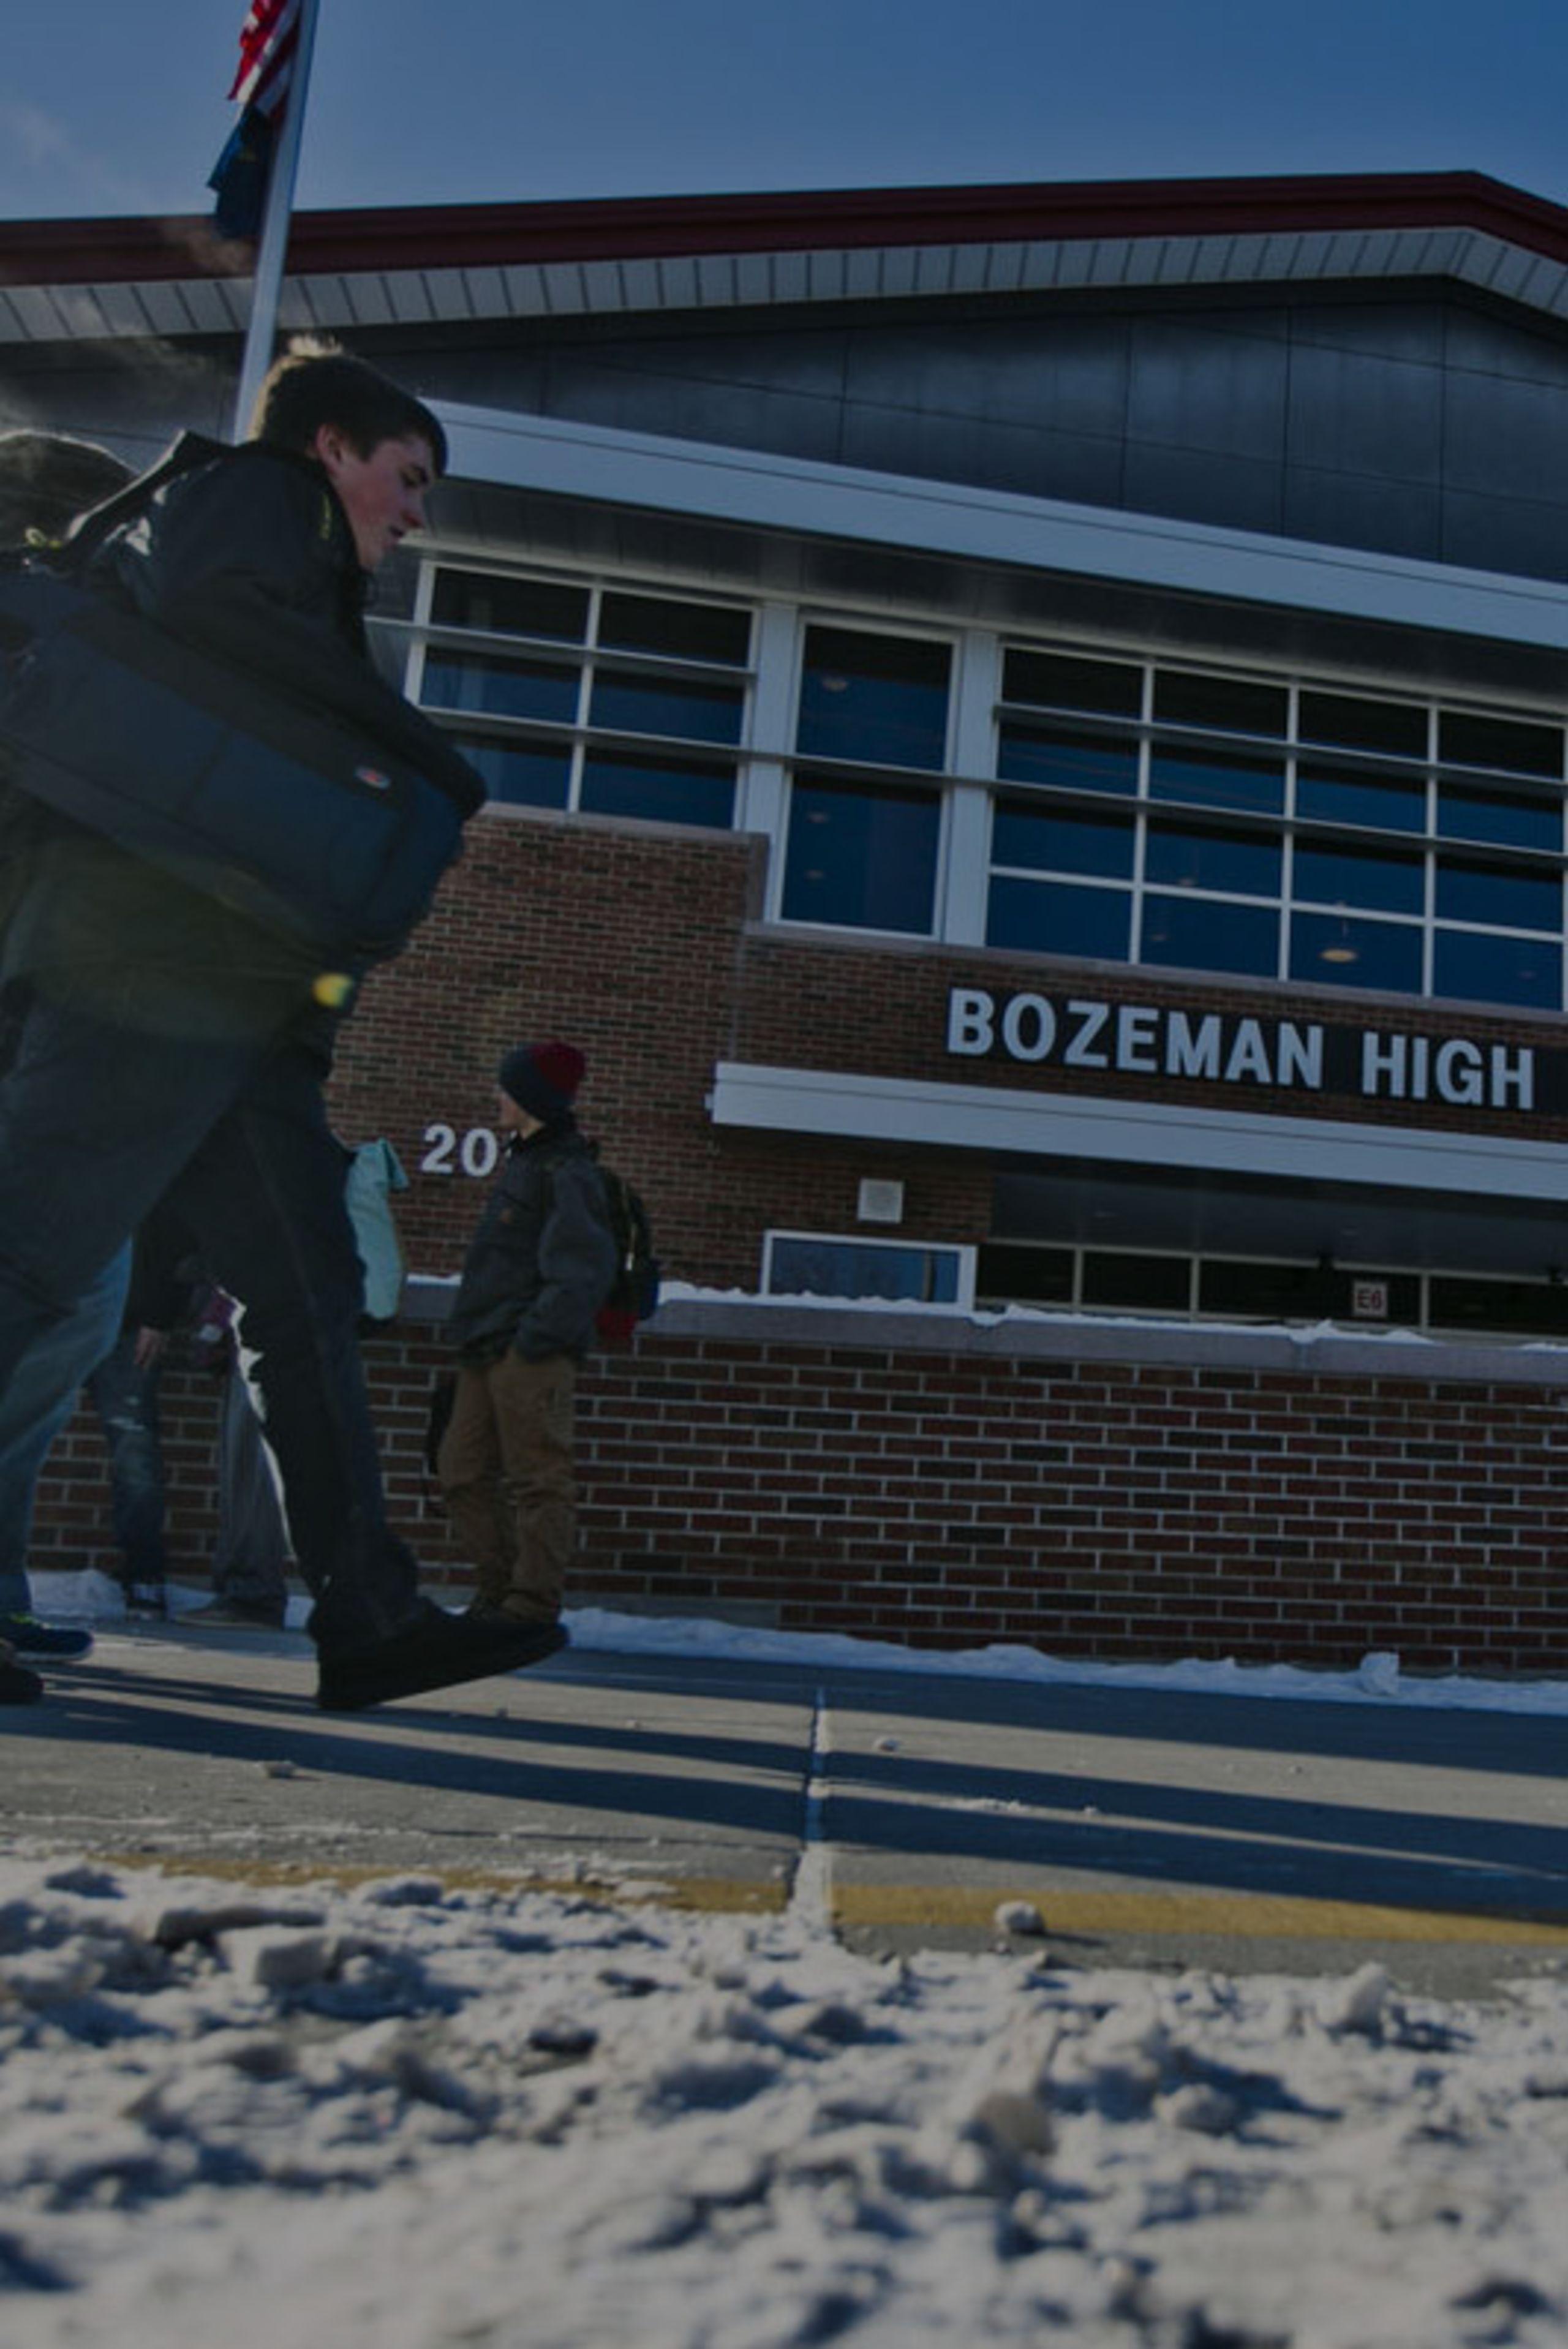 U.S. News ranks Bozeman High No. 1 in Montana